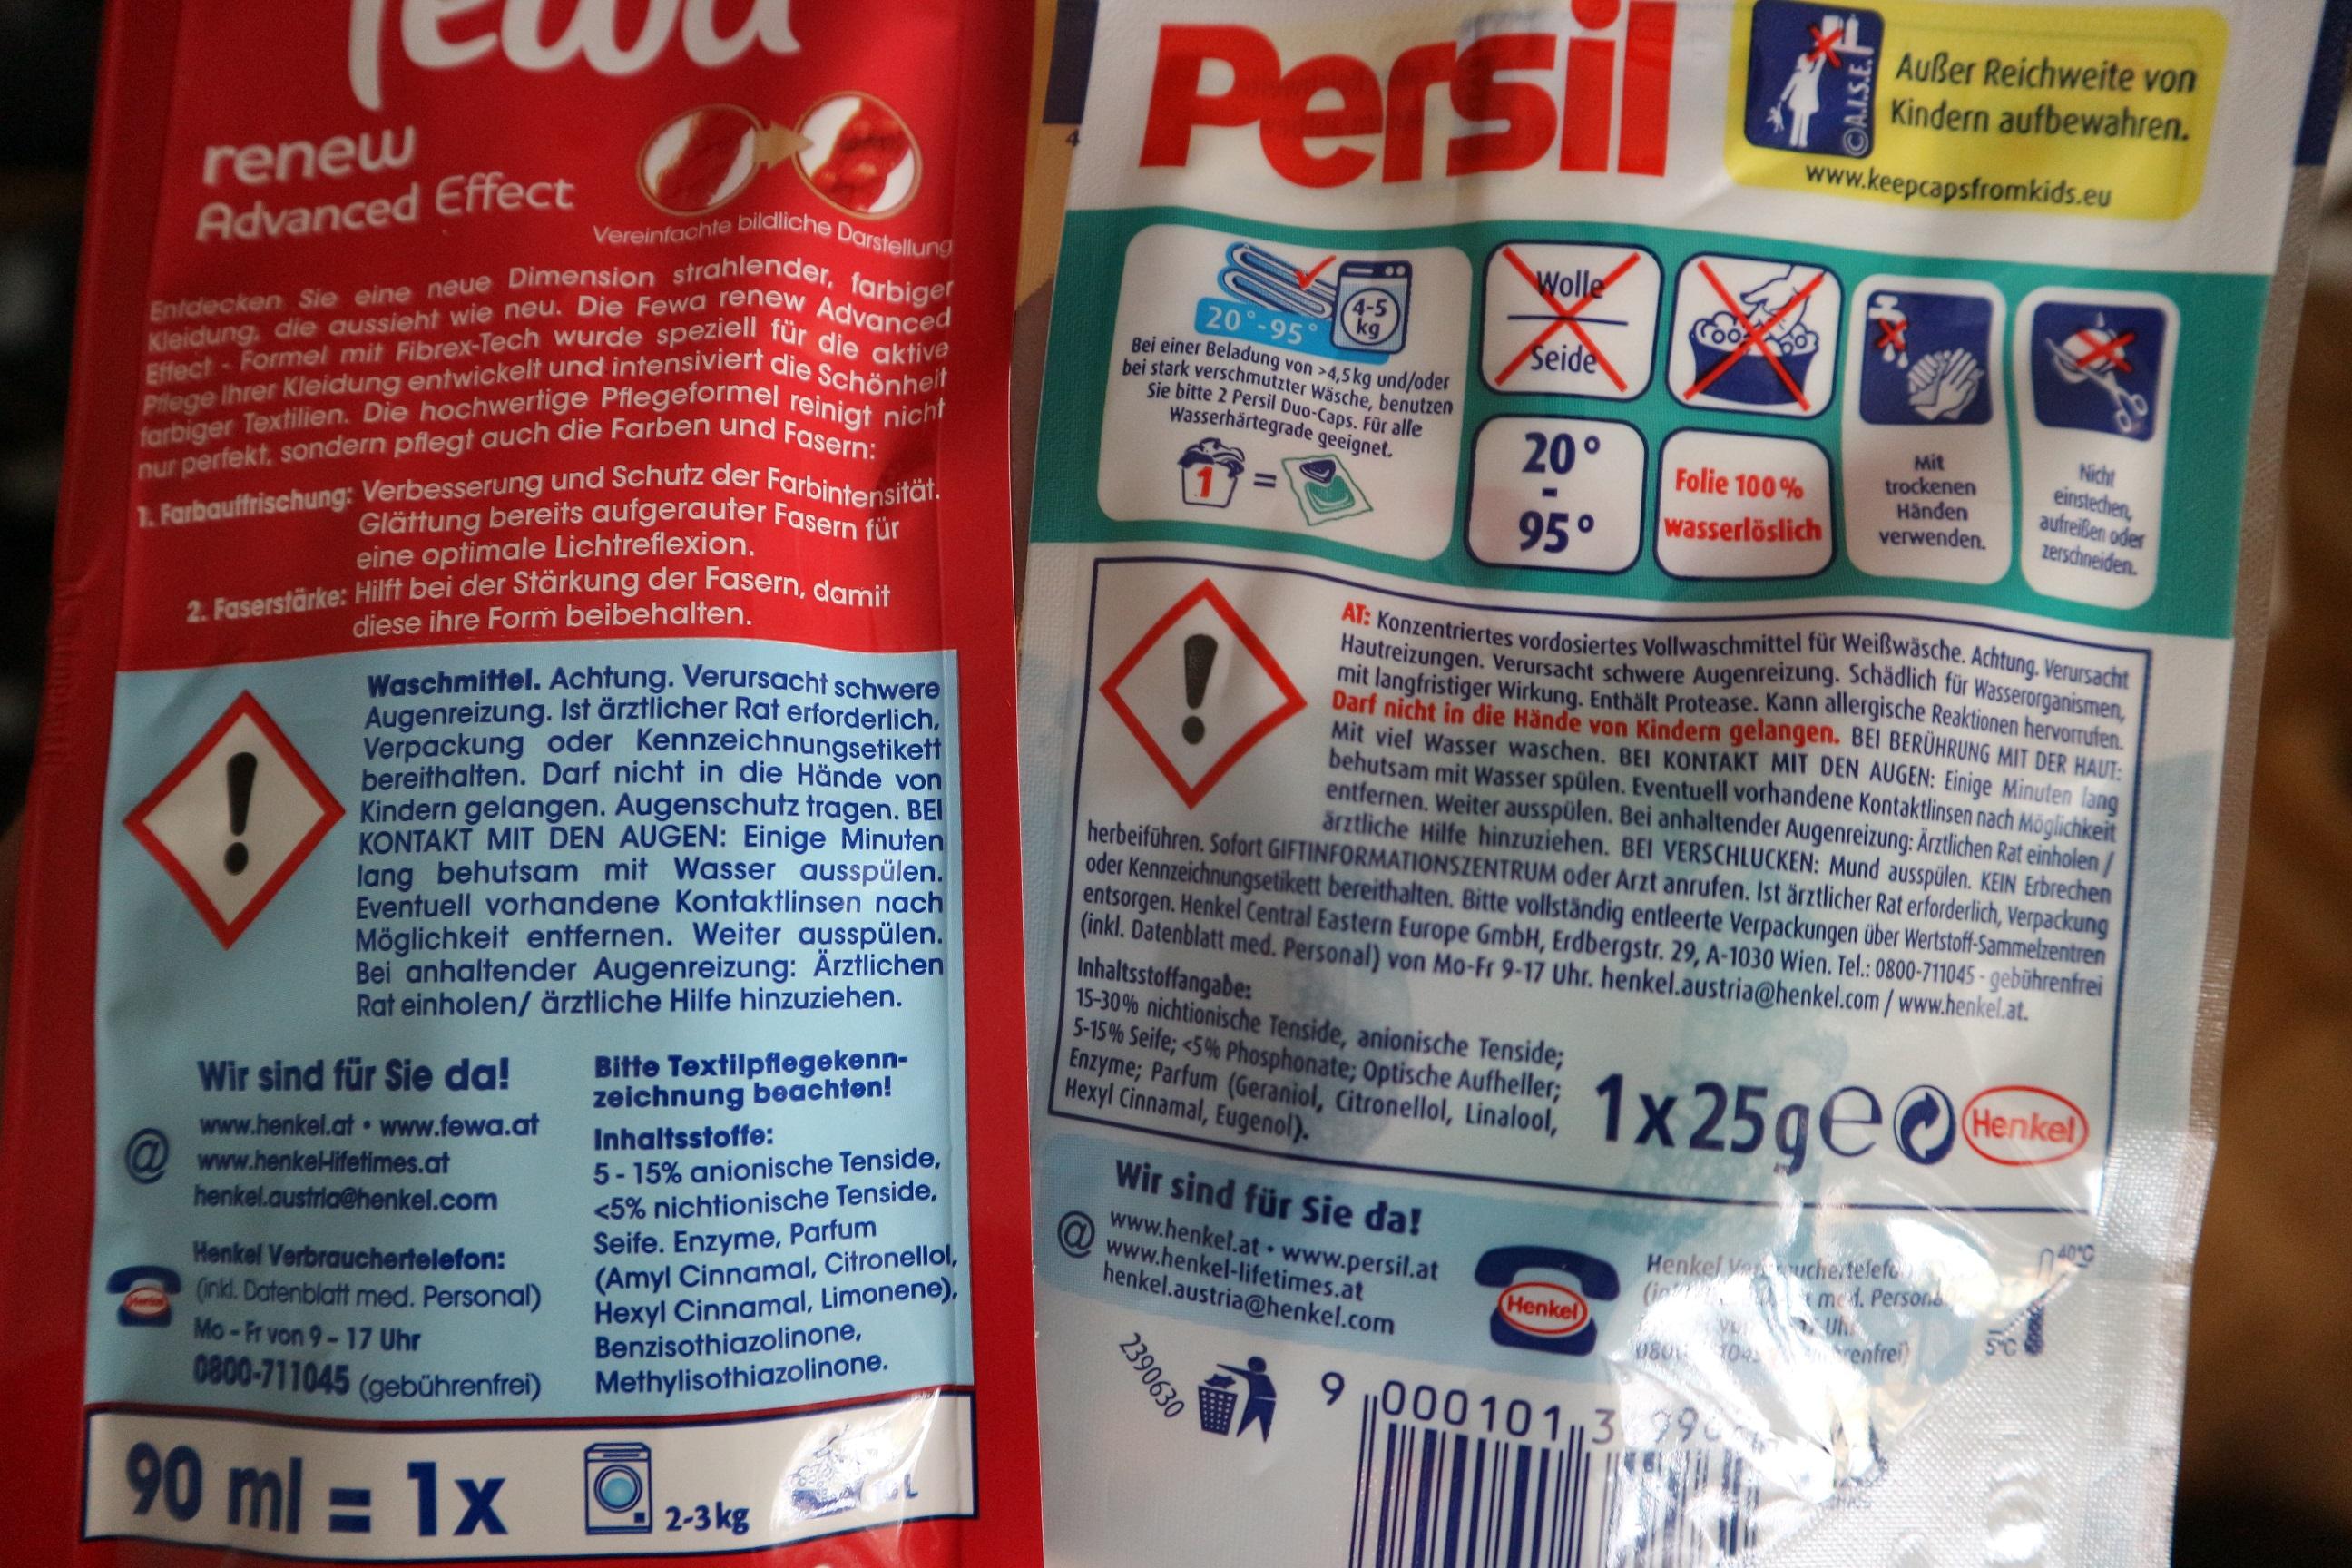 Gratis Waschmitteltest//Coca Cola Zero, Graz/Liebenau(Murpark)